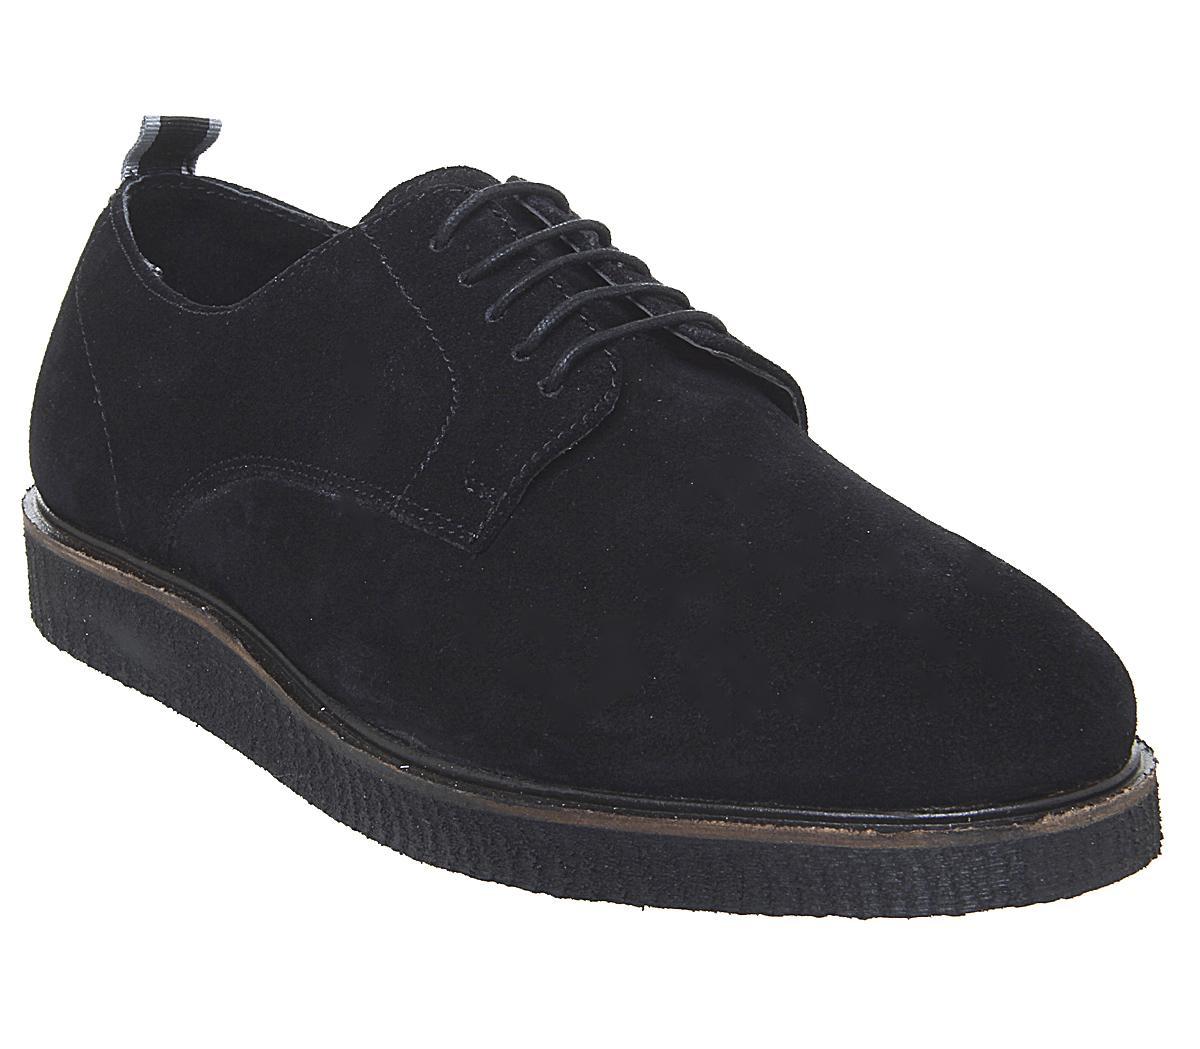 Office Cade Derby Shoes Black Suede